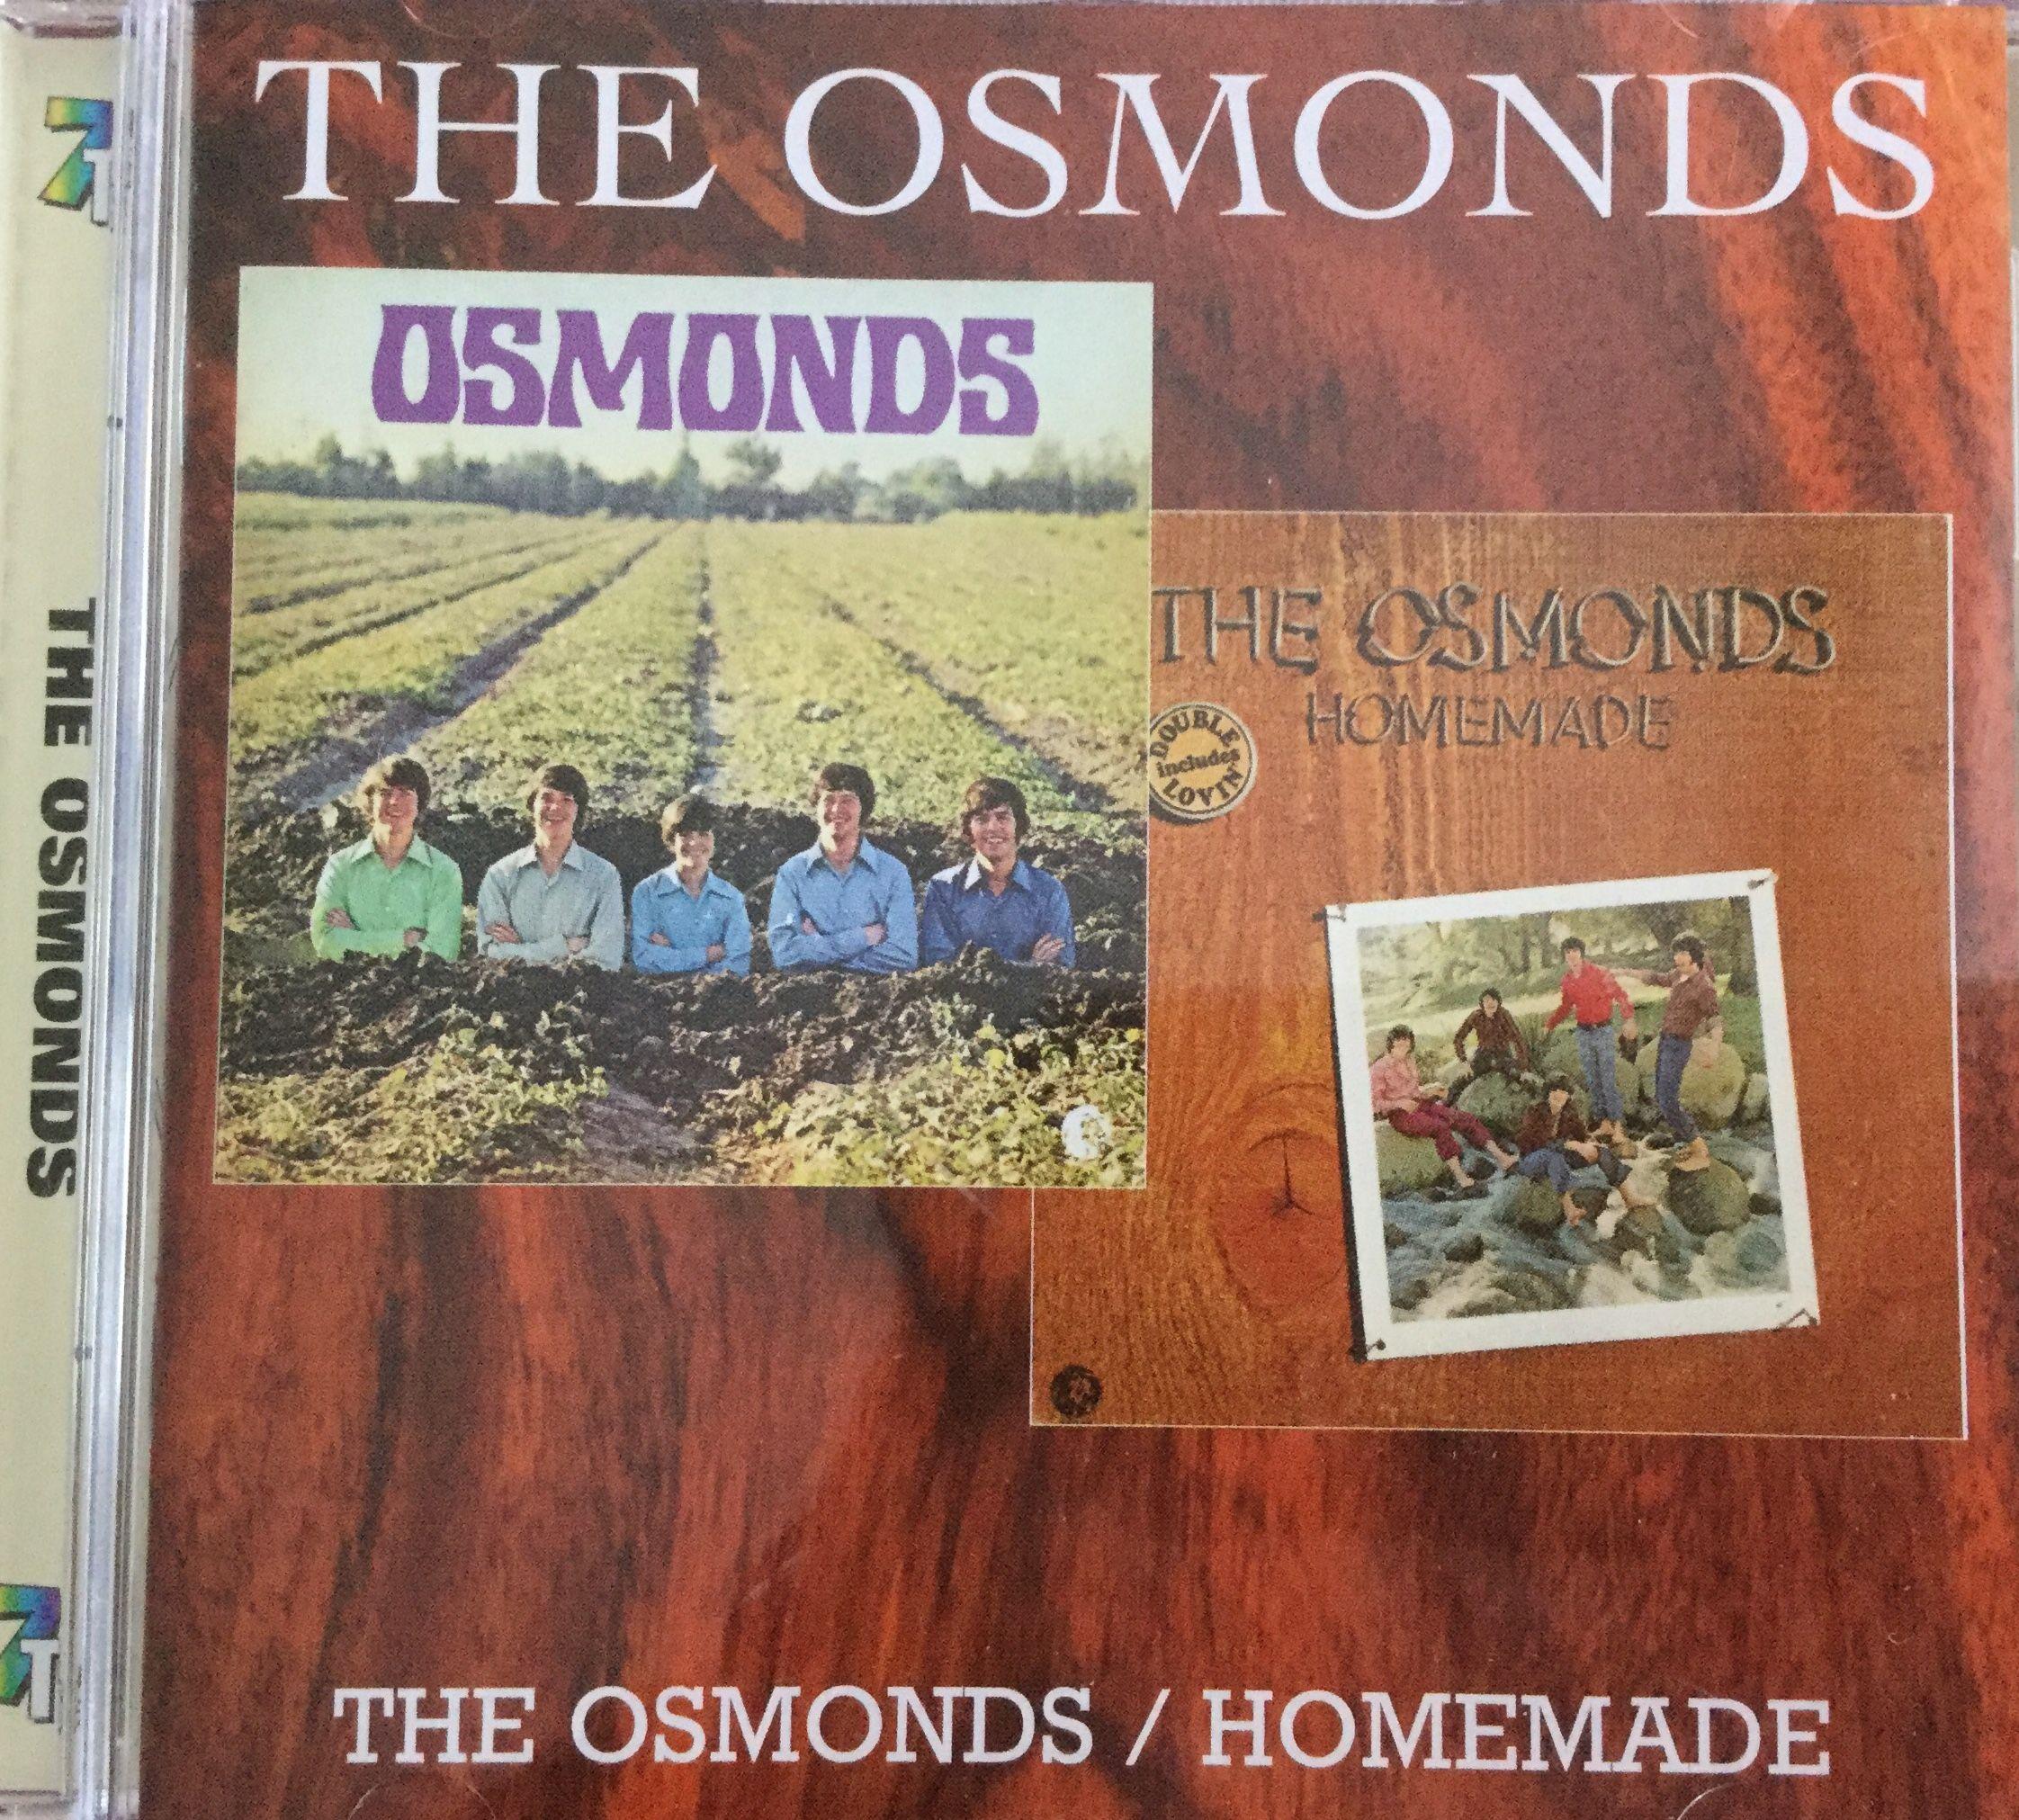 Pin by Linda Bayley on Osmond CDs The osmonds, Osmond